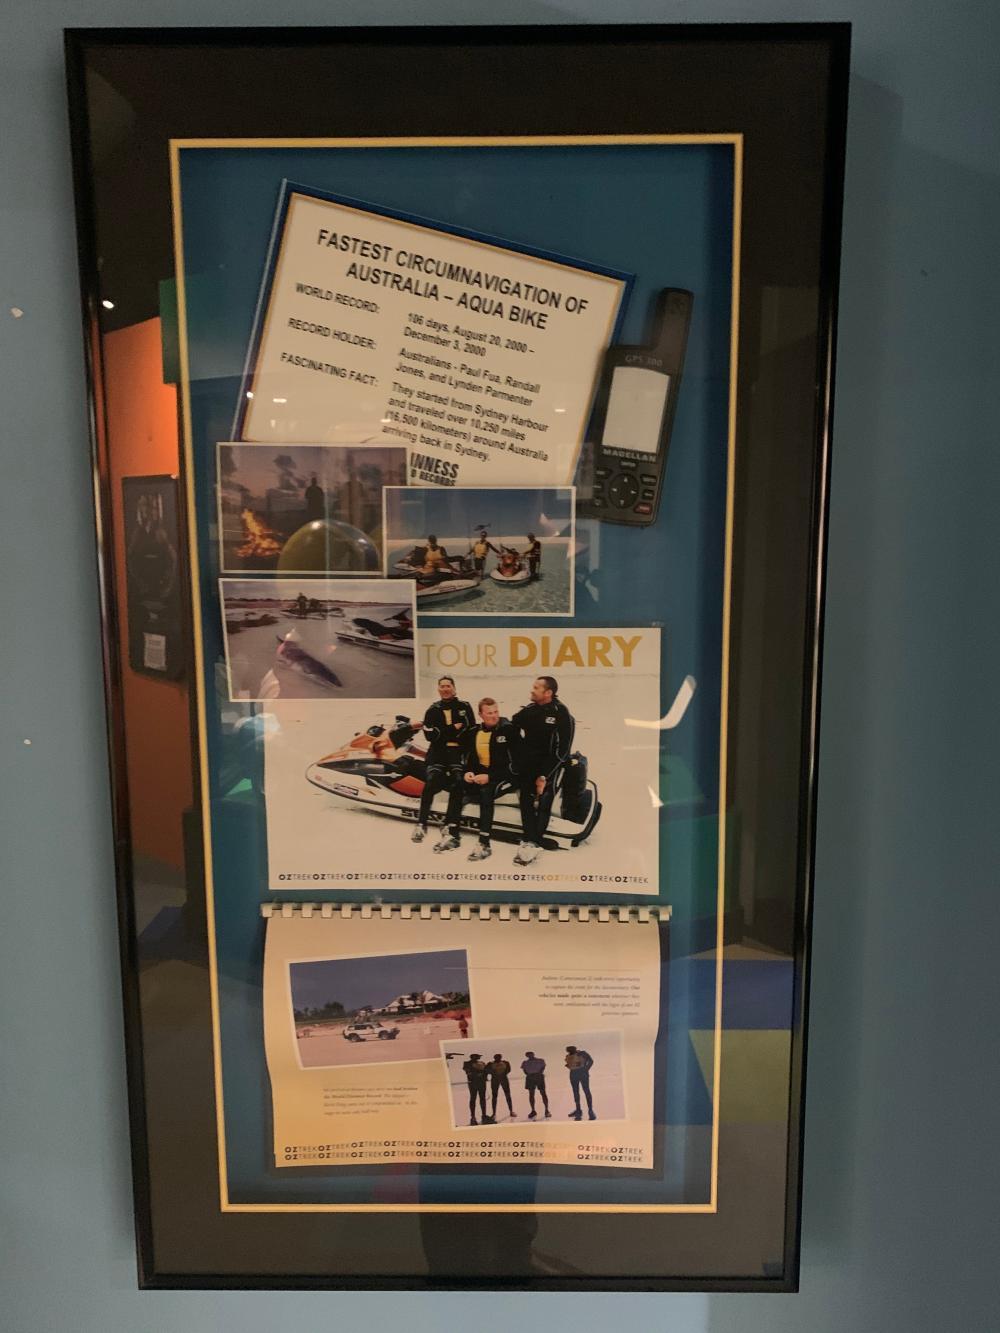 Fastest Circumnavigation of Australia Framed Museum Display Guinness World Record